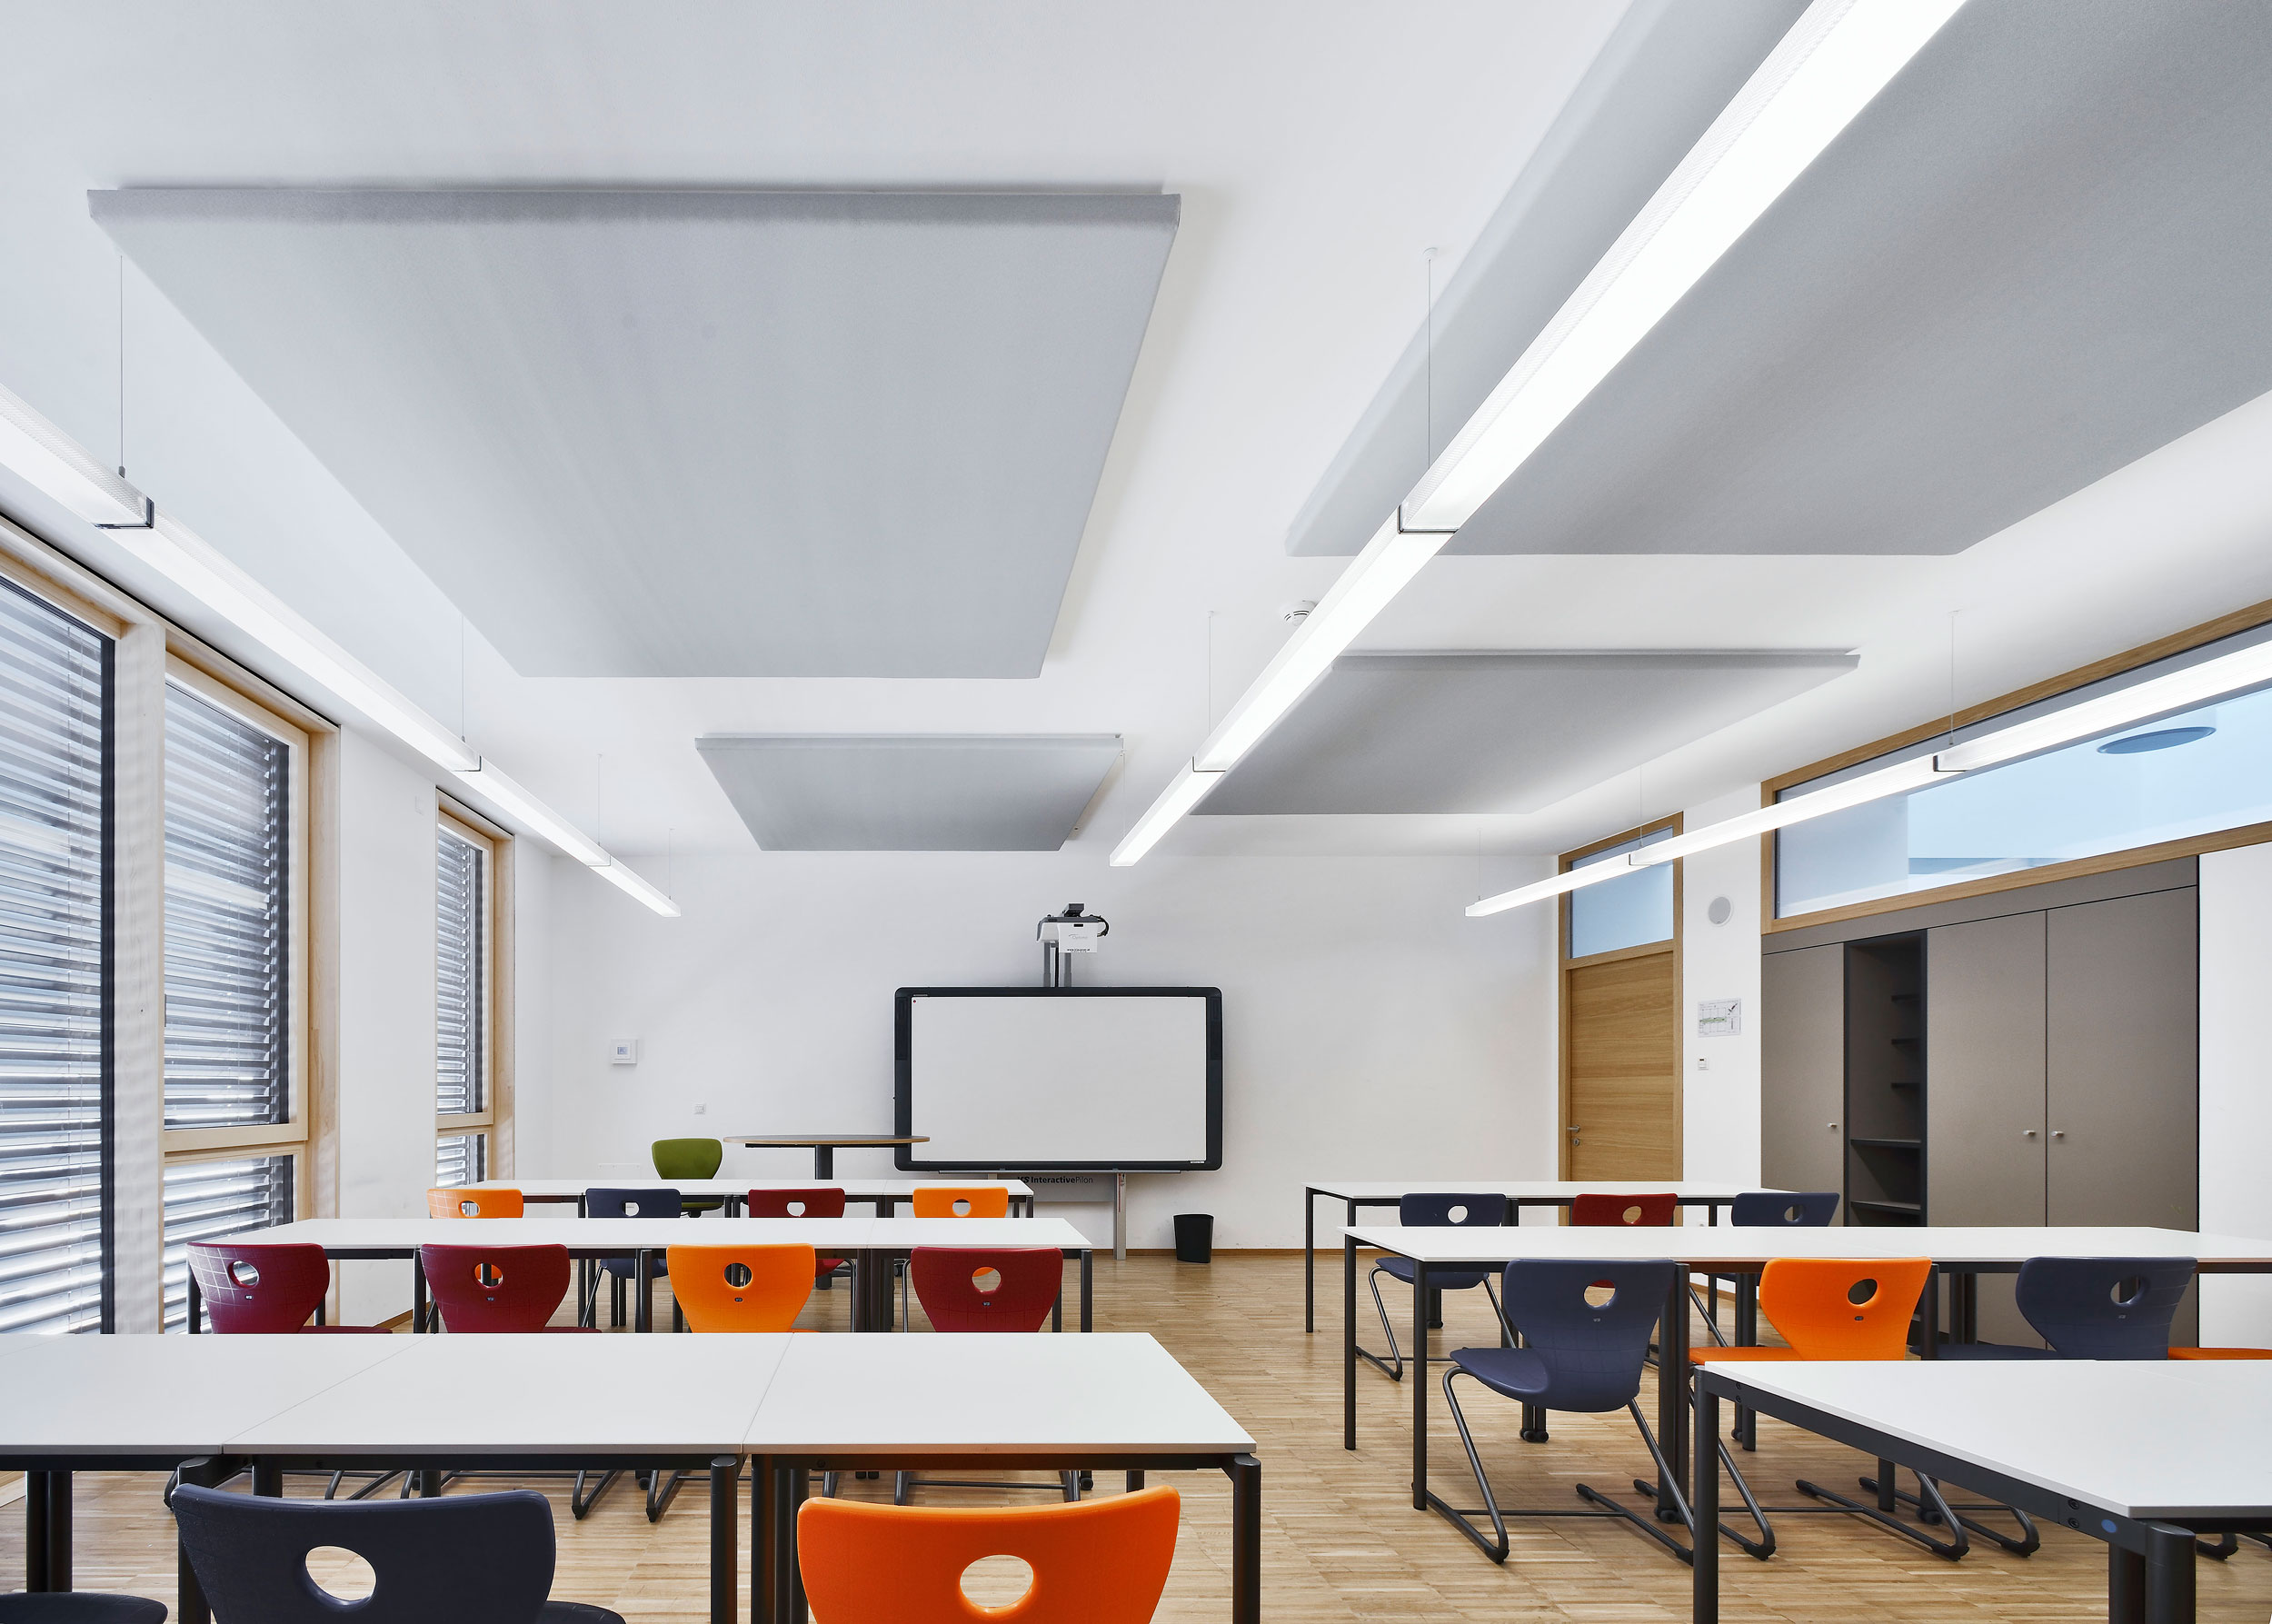 Hotelfachschule_D3Z2585B.jpg